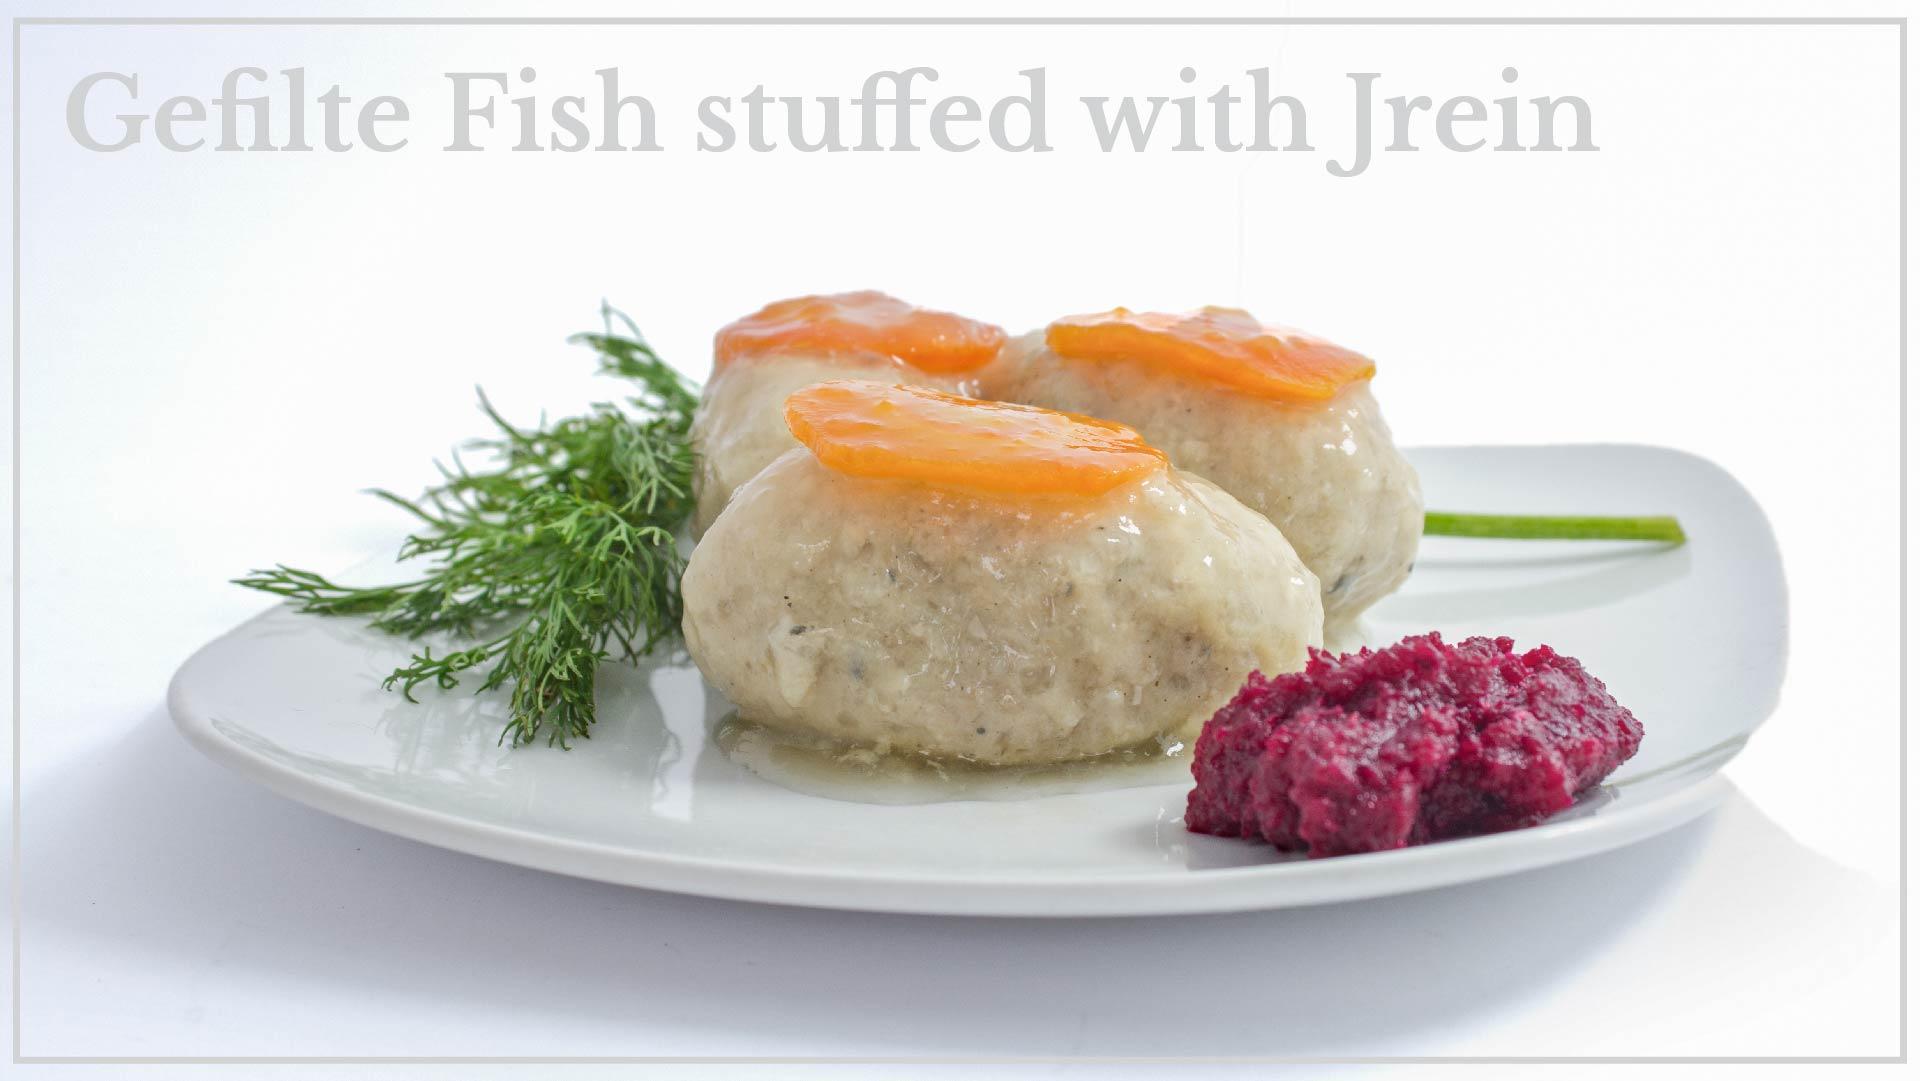 Gefilte fish with Jrein - fish stuffed with Jrein (beet-based dressing)